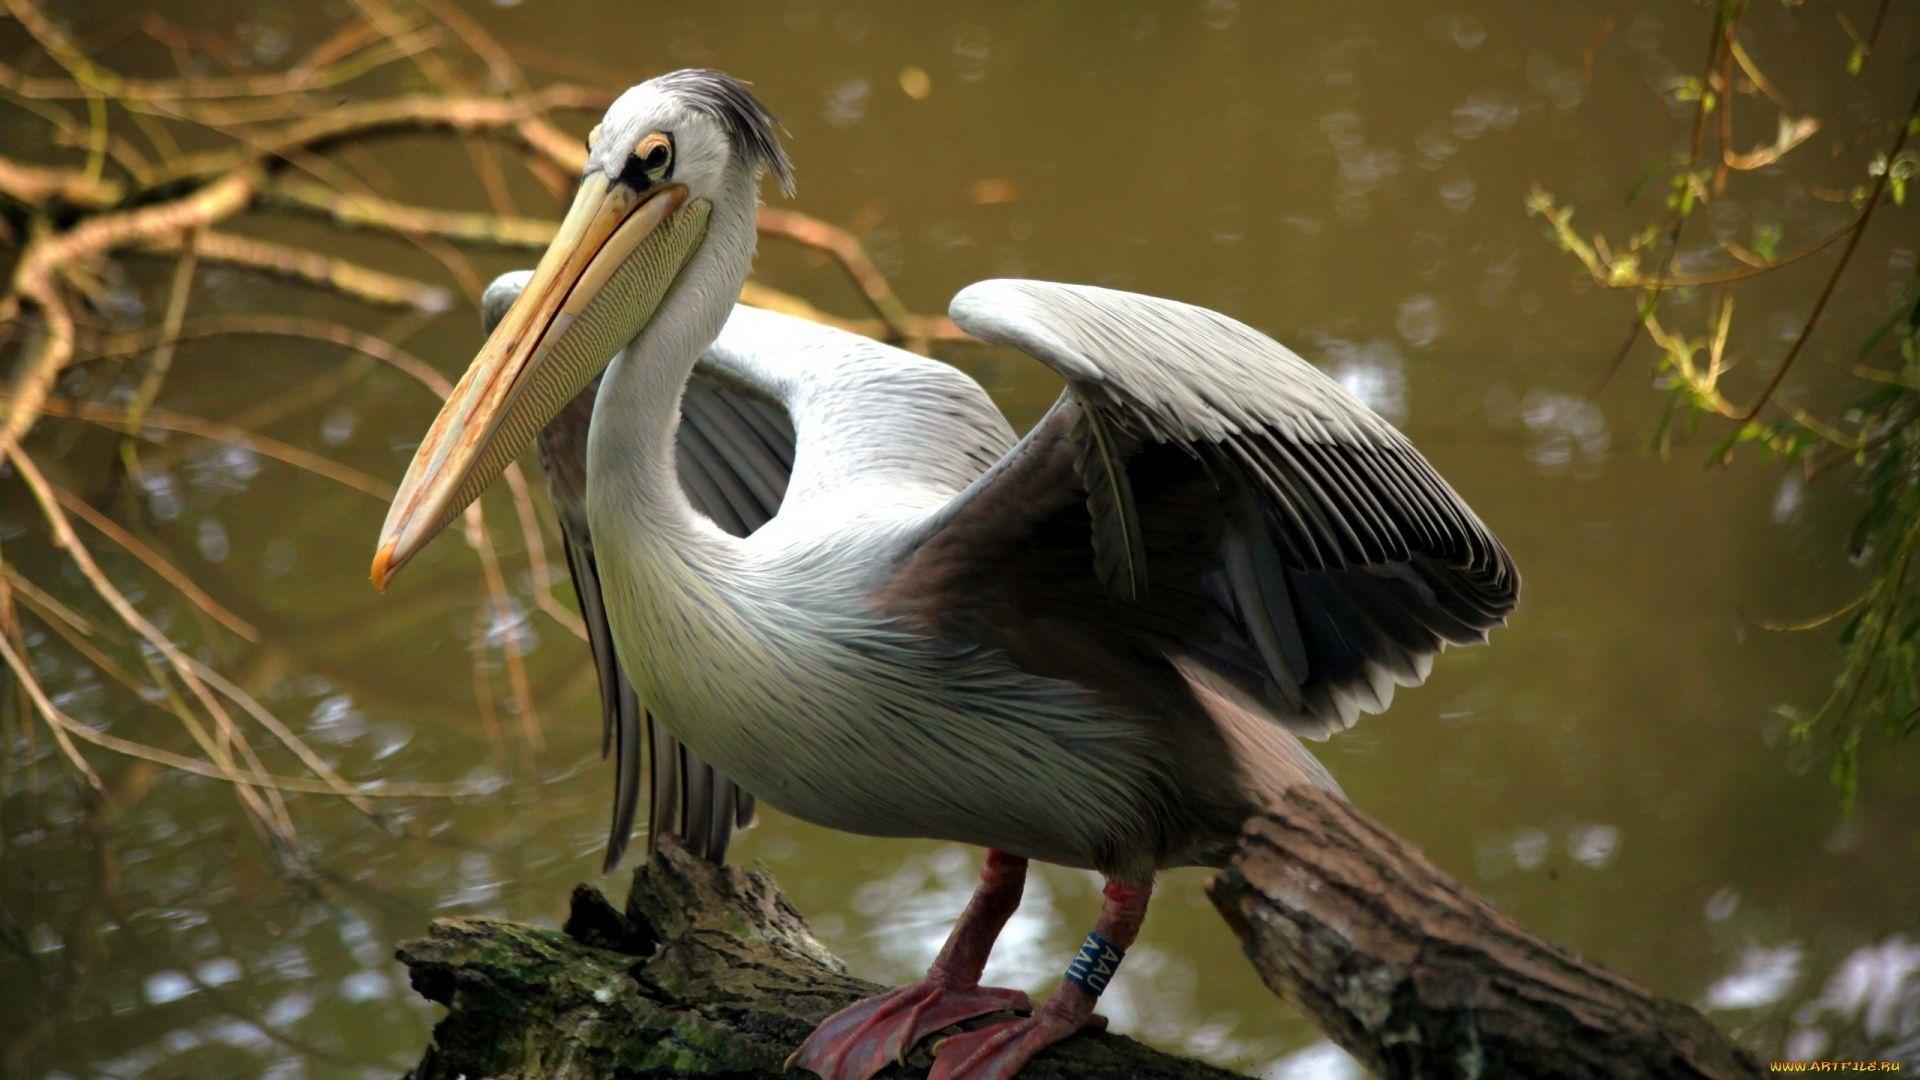 Pelican wallpaper for pc